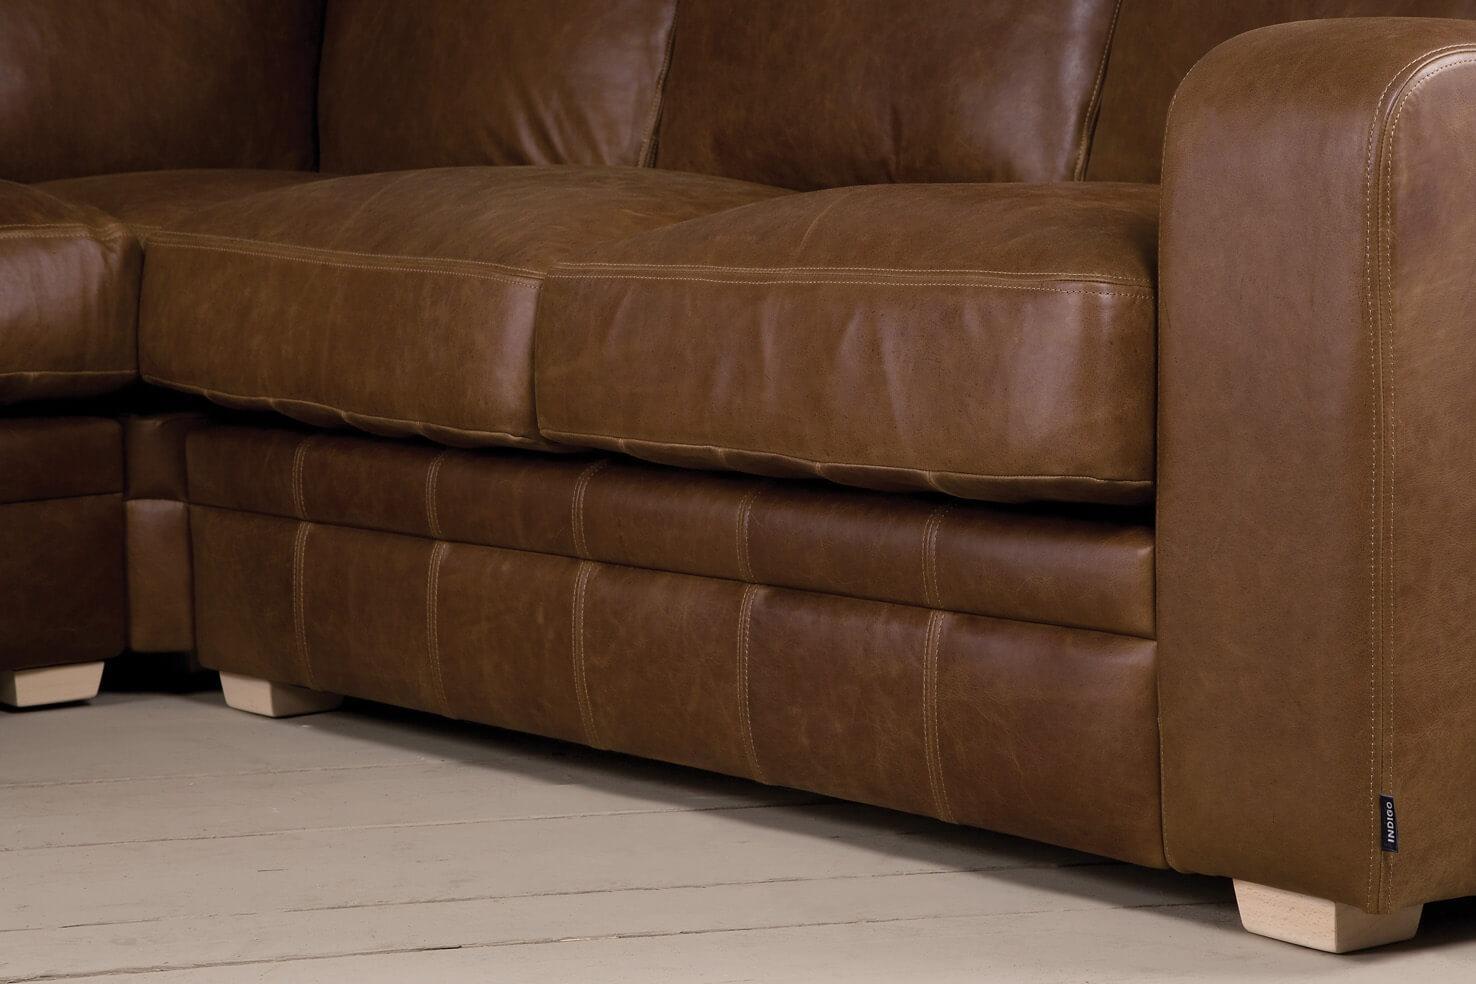 The Square Arm Leather Corner Sofaindigo Furniture Within Corner Sofa Leather (Image 19 of 20)